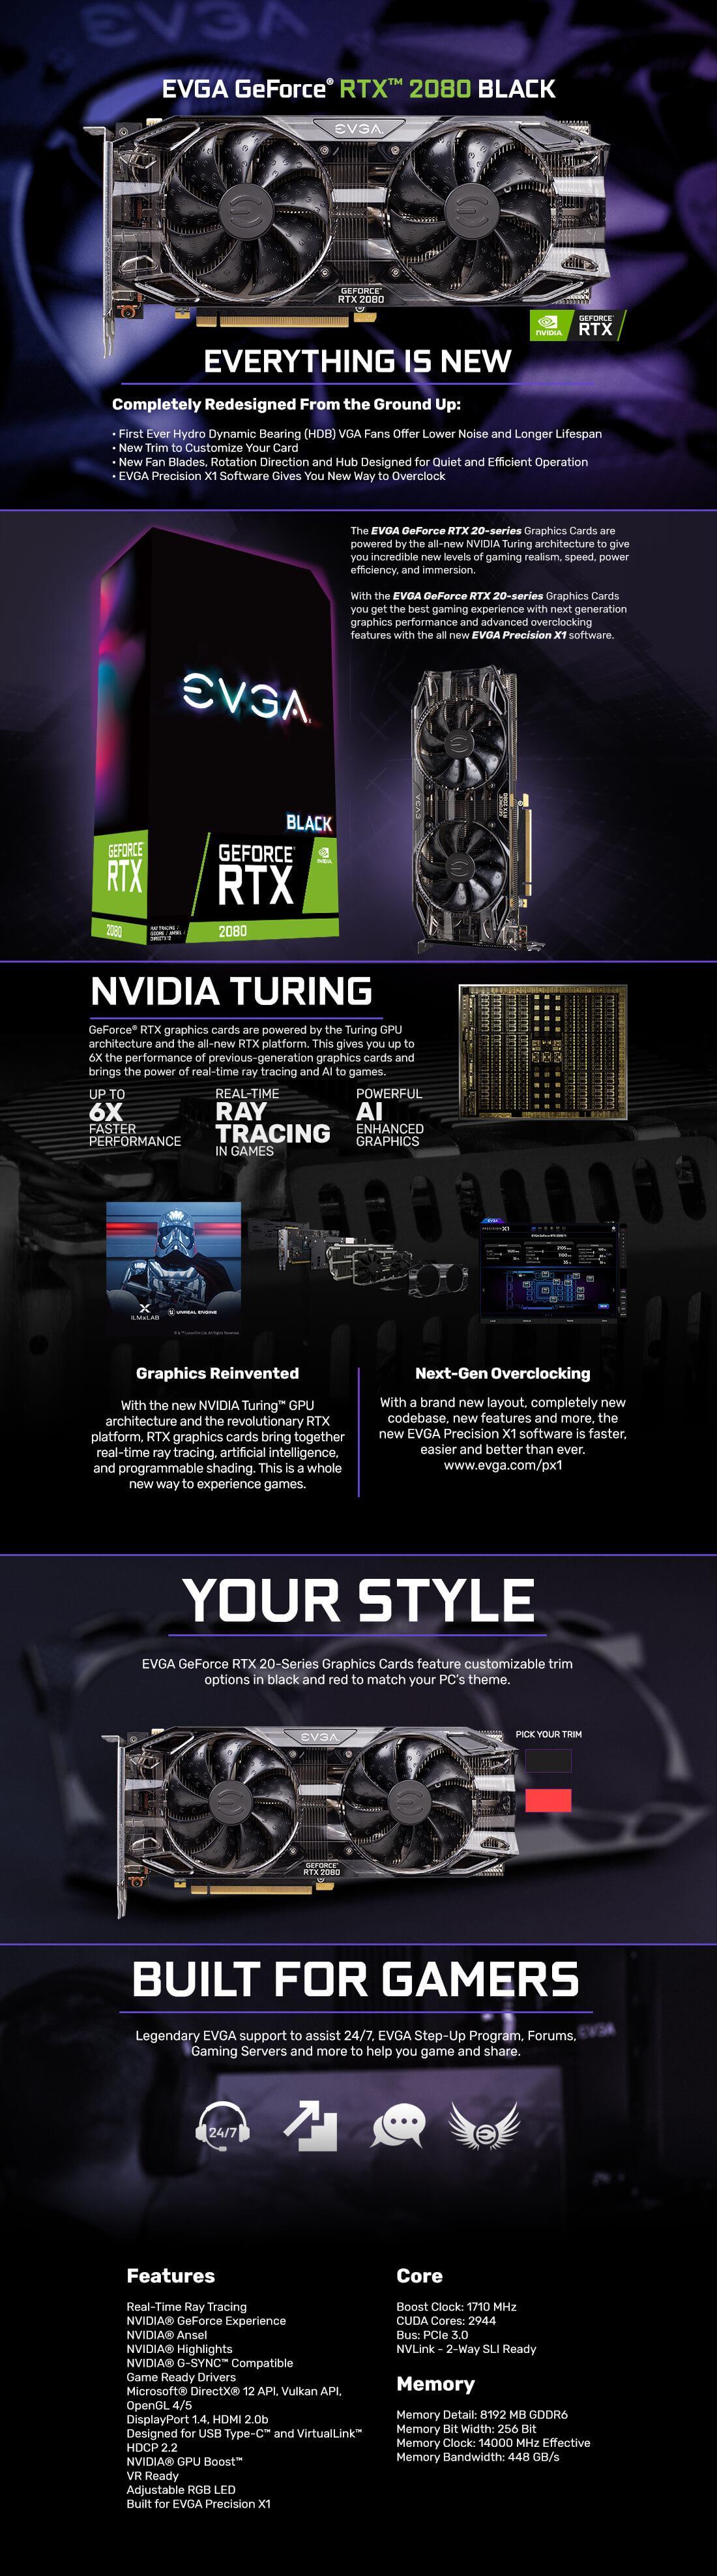 Buy the EVGA Geforce RTX 2080 Black Edition 8GB GDDR6 Gaming